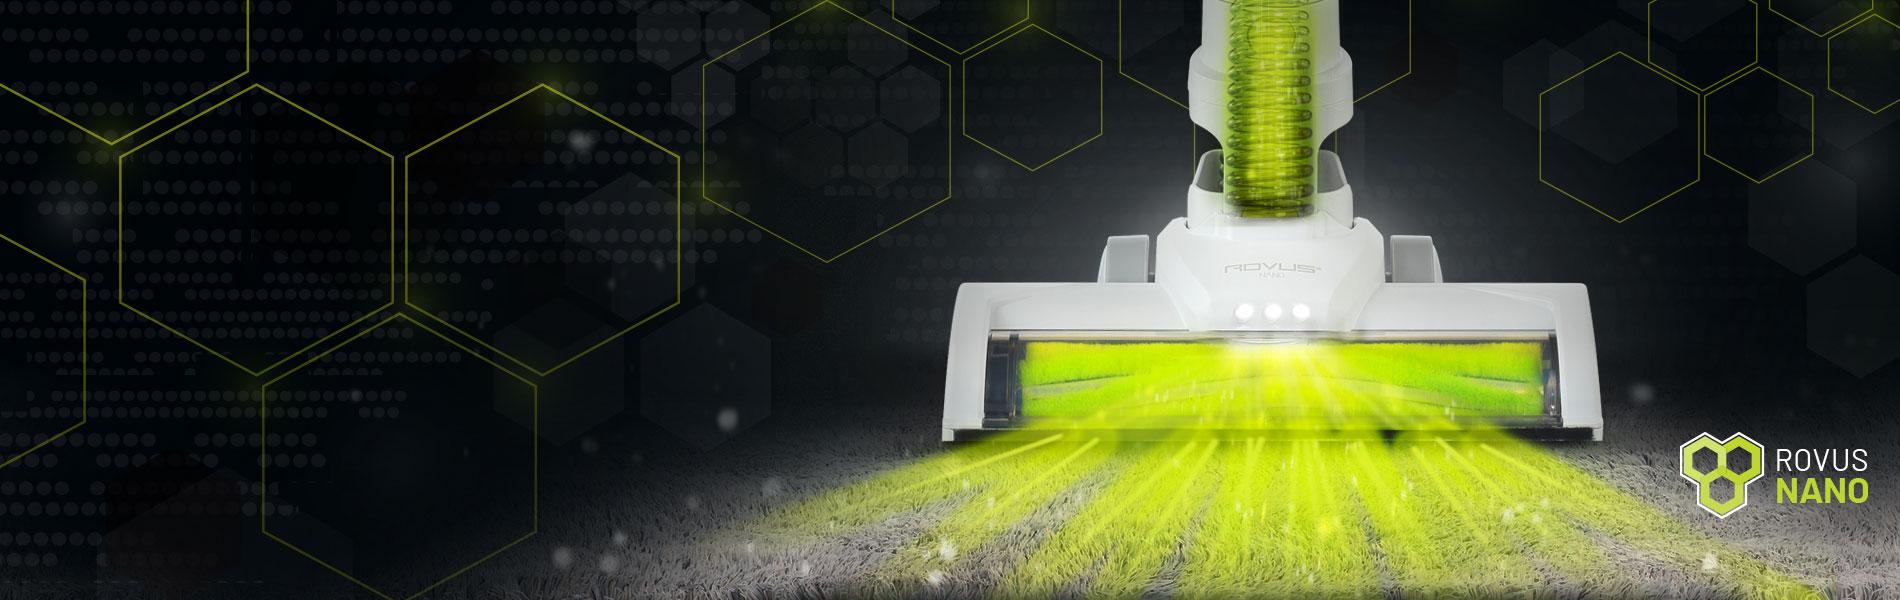 Rovus Nano Multiuse Вертикална правосмукалка